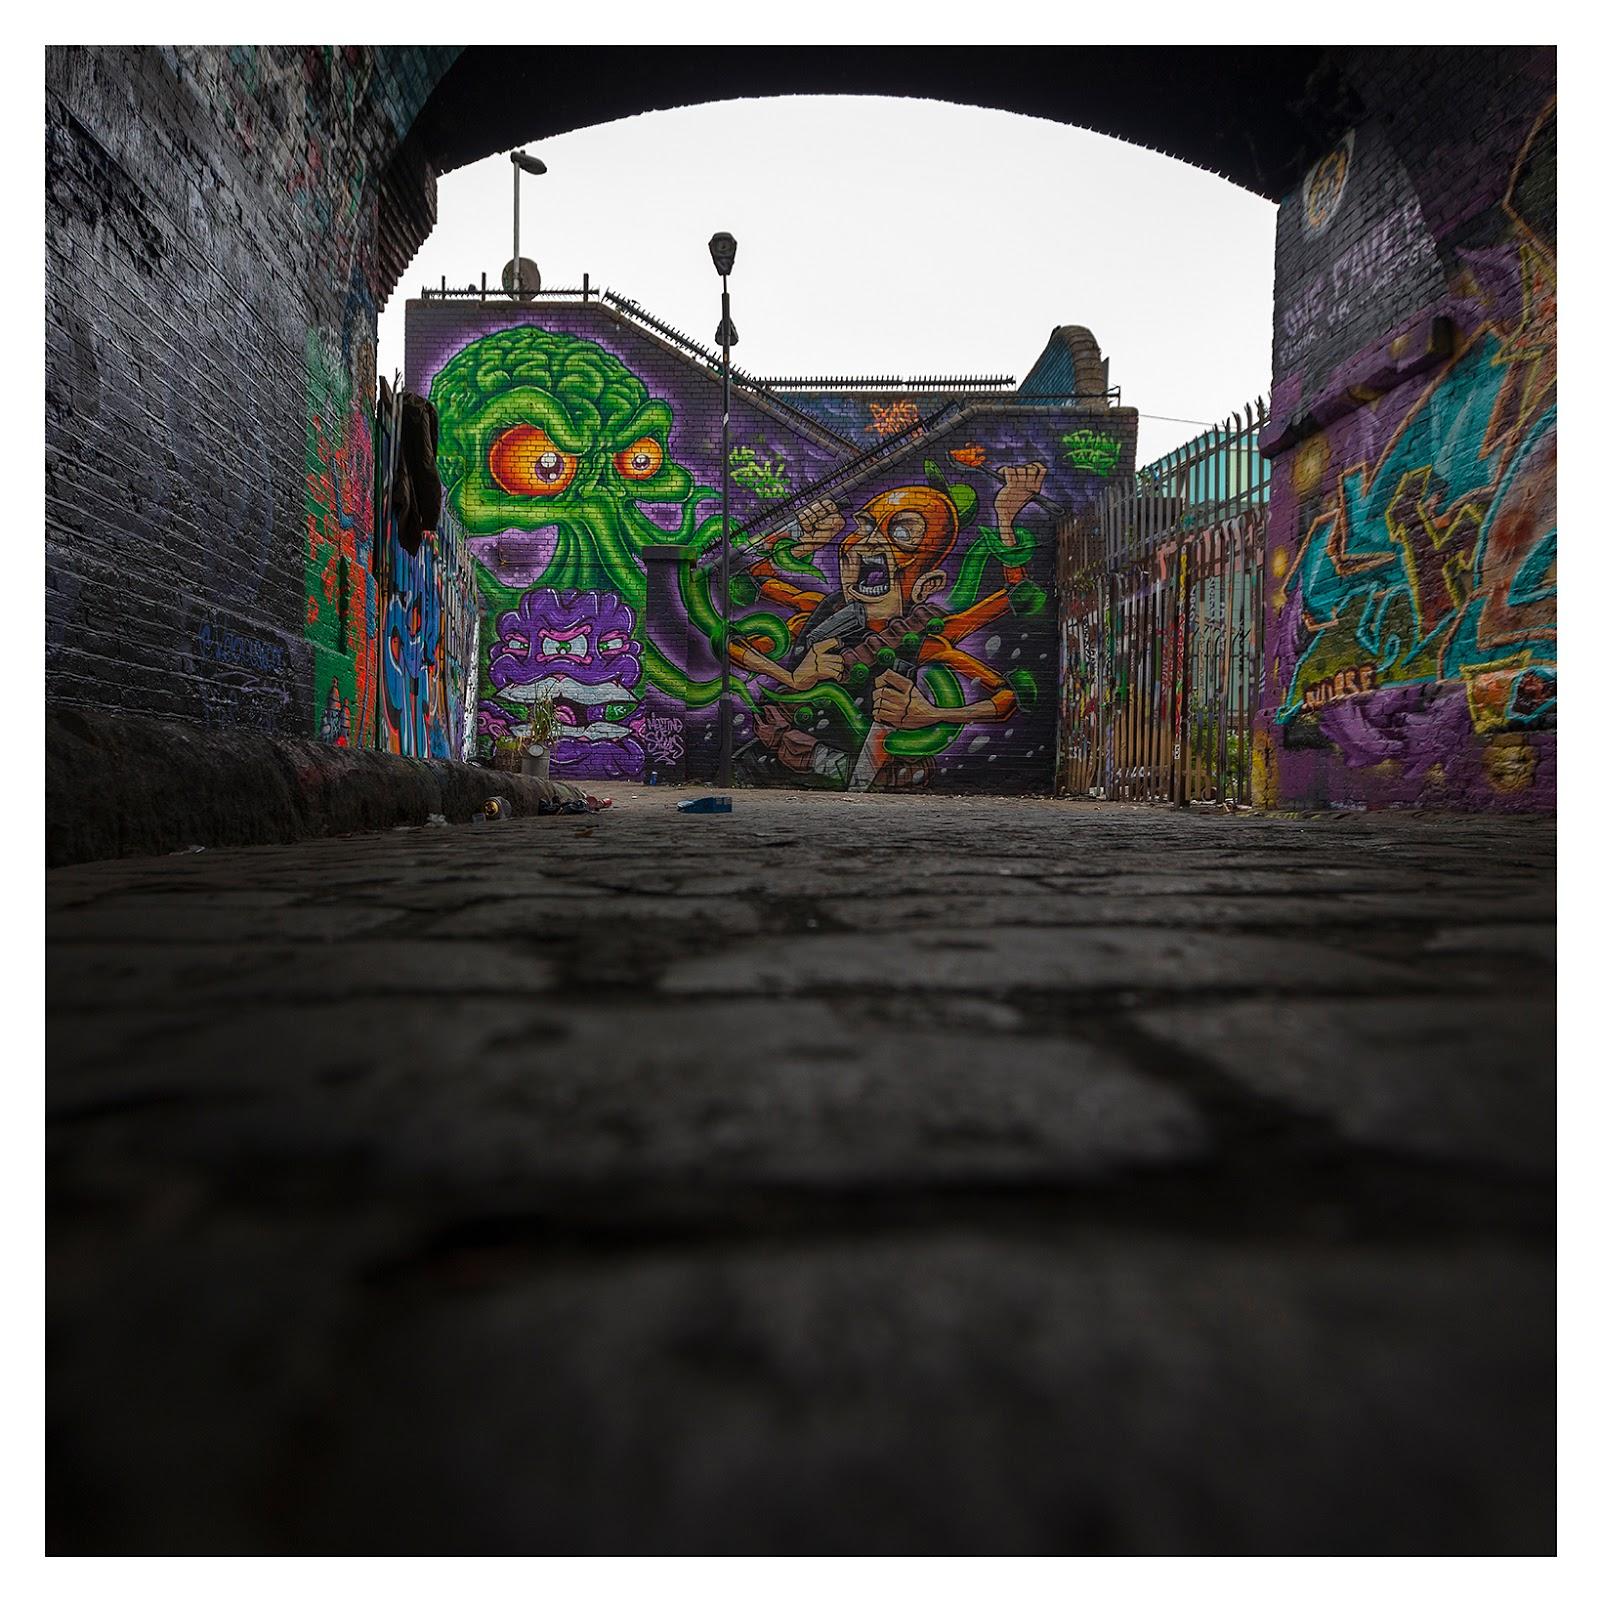 Captain Kris / The Real Dill + Dahkoh Brick Lane Street Art